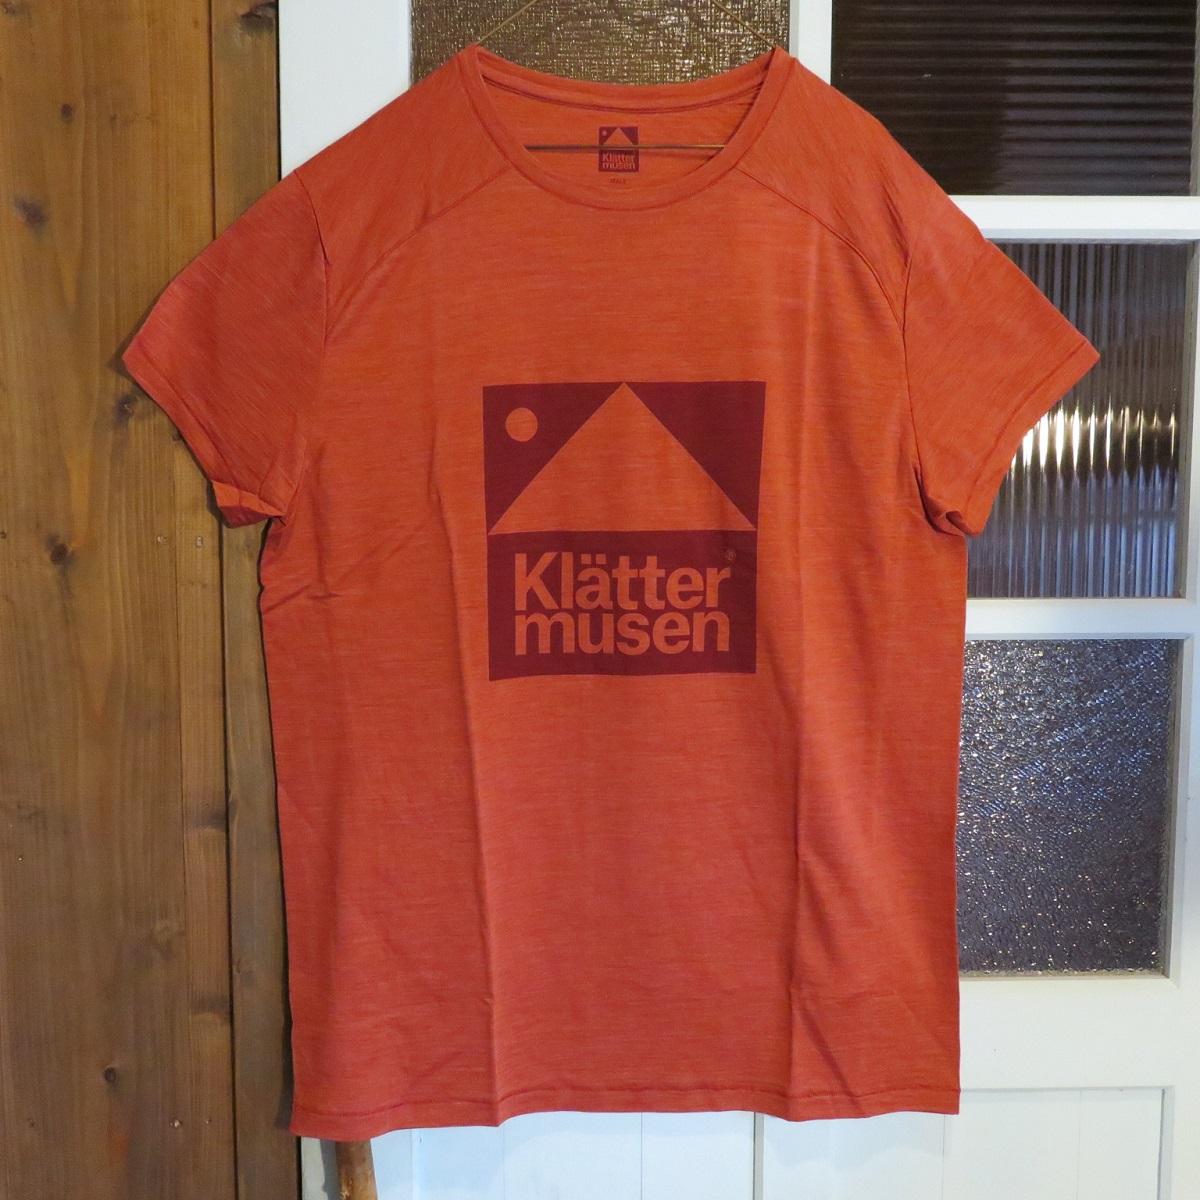 KLATTERMUSEN(クレッタルムーセン) Eir Teeイールティー M's REDWOOD Mサイズ 【Tシャツ】【正規輸入品】【メンズ】